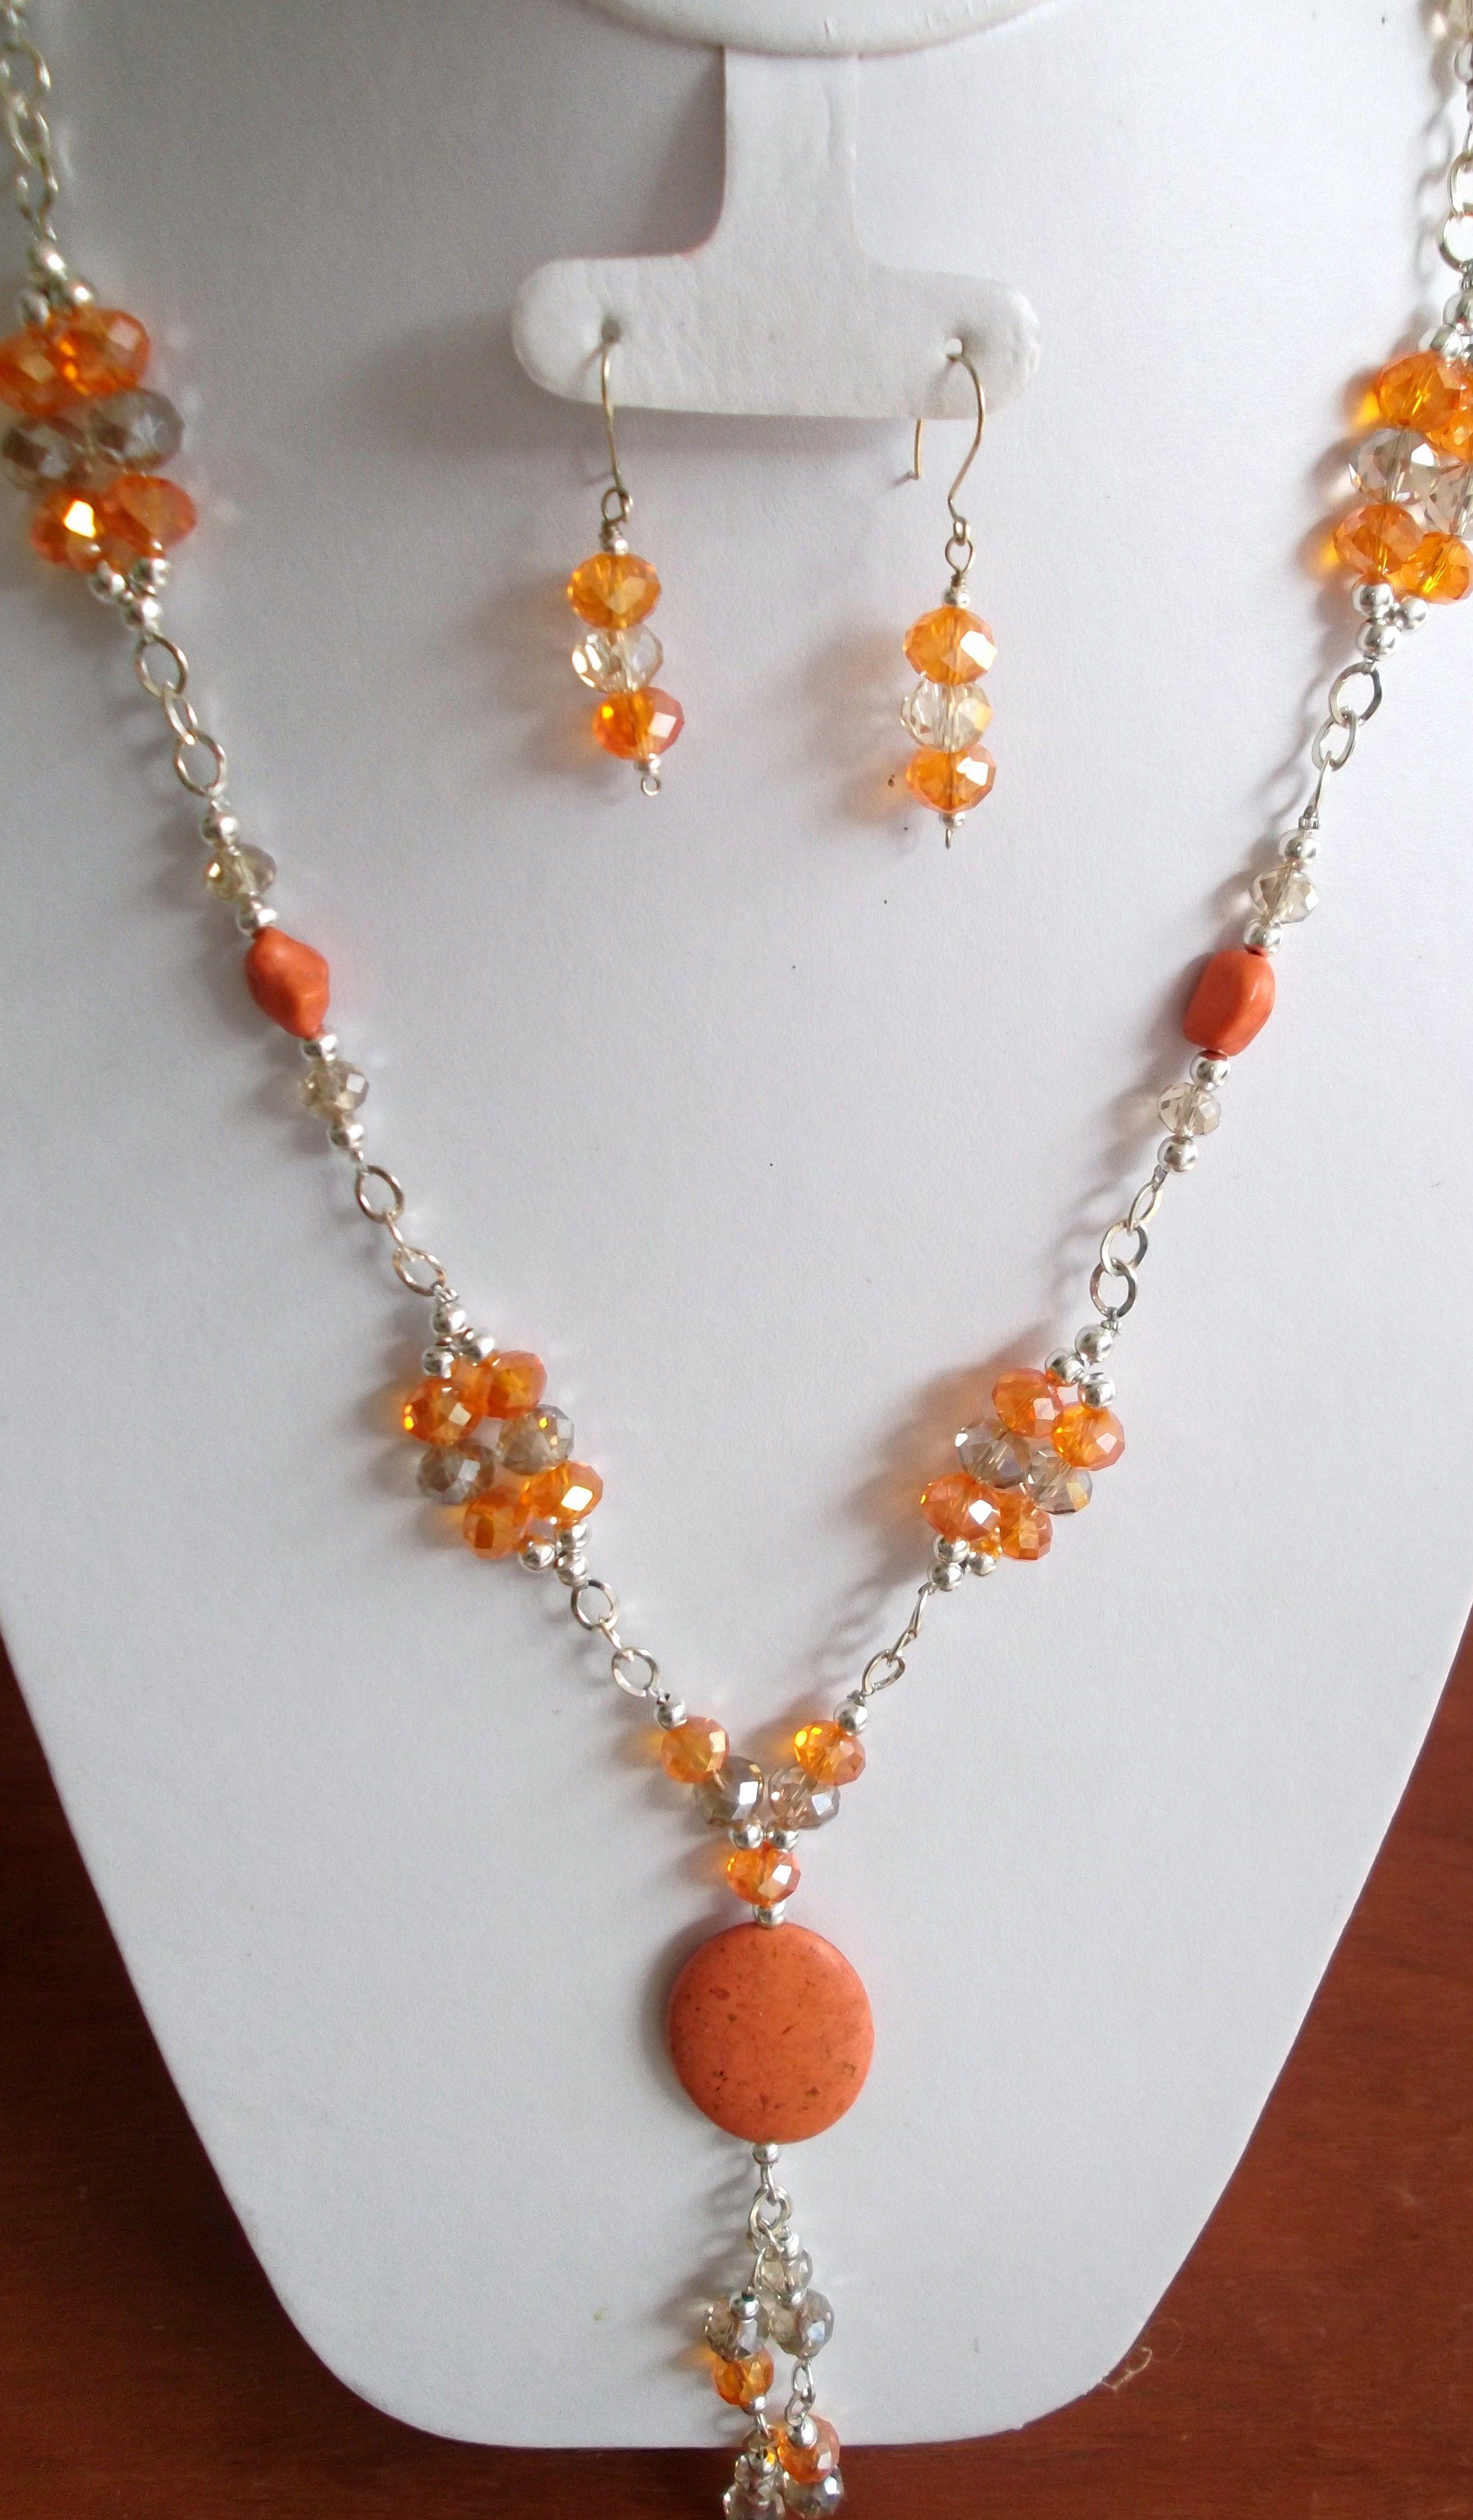 b3e58bd6a3e7 Collar anaranjado en cristal y cadena..